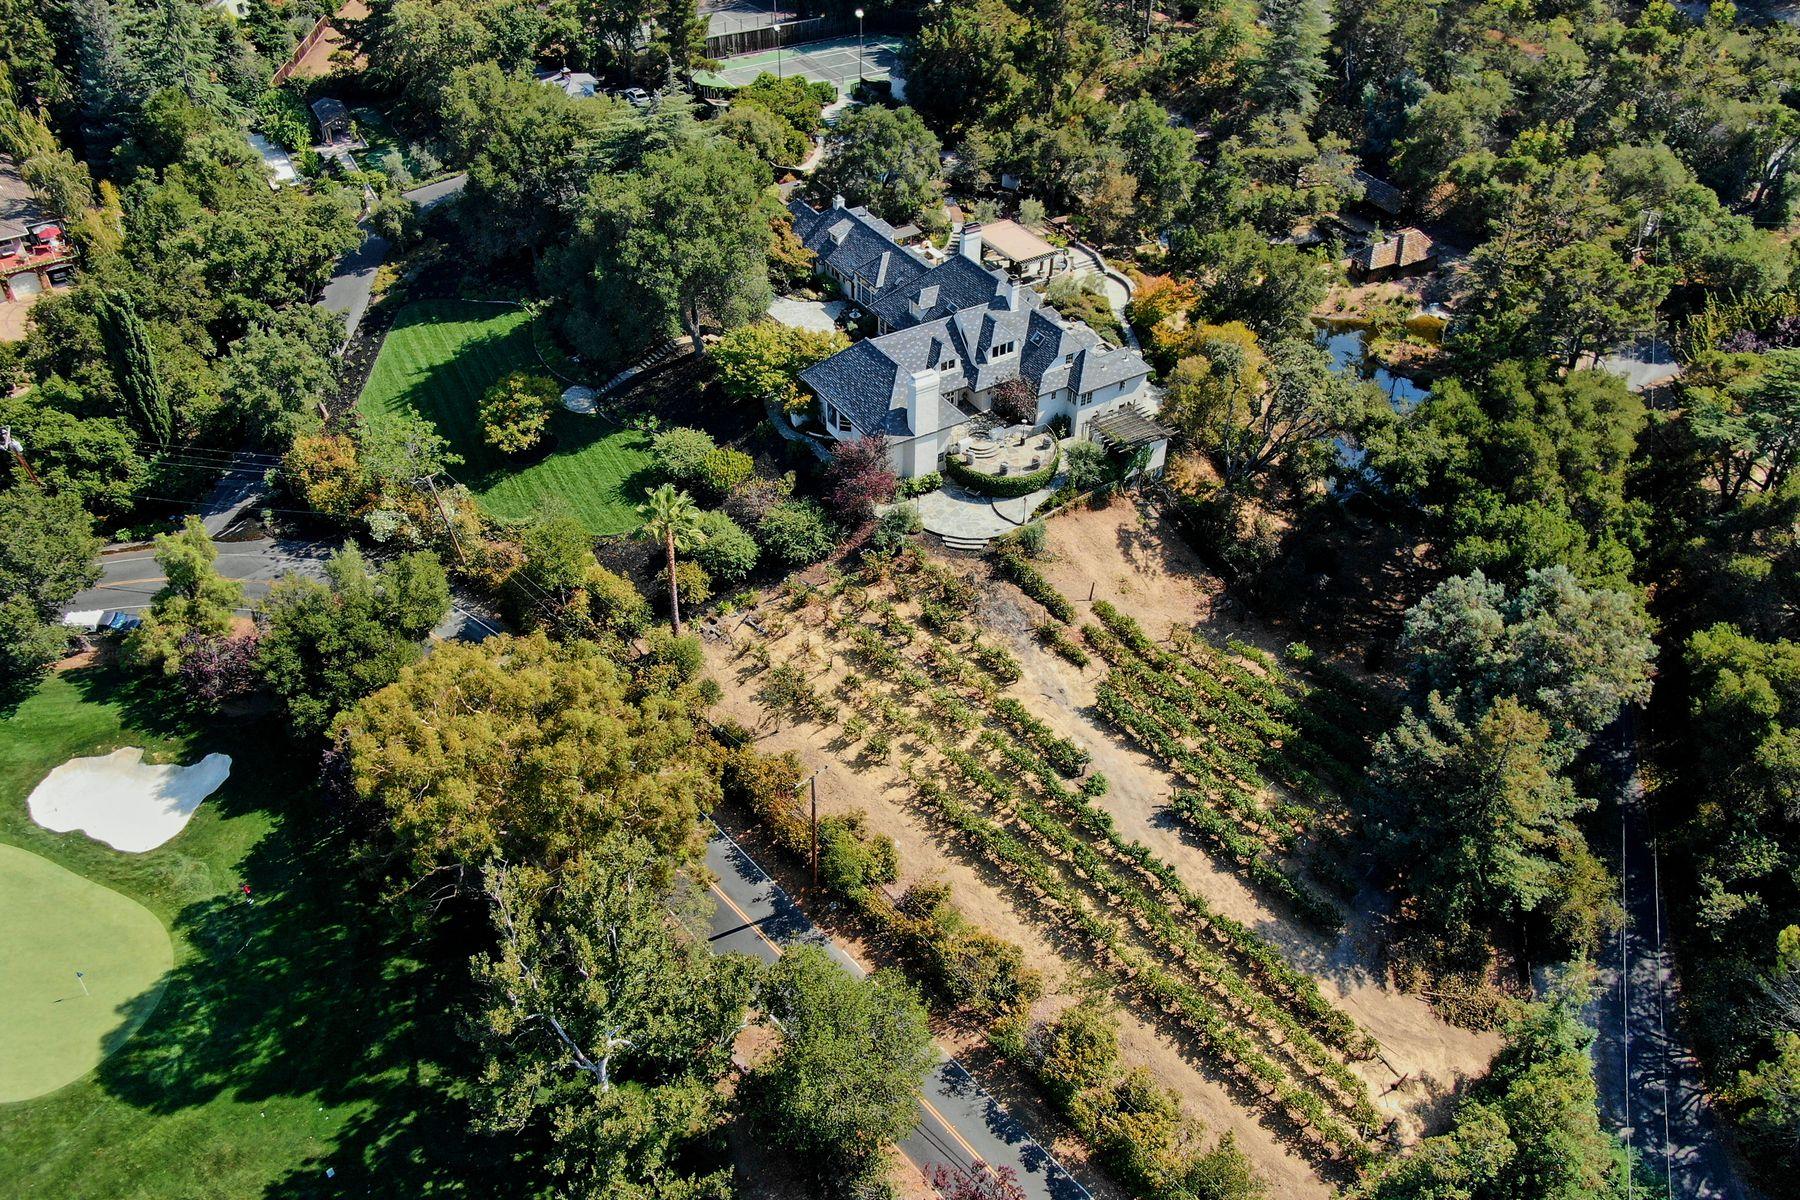 Land for Sale at Los Altos Country Club Parcel 680 Loyola Dr Vineyard Lot Los Altos, California 94024 United States